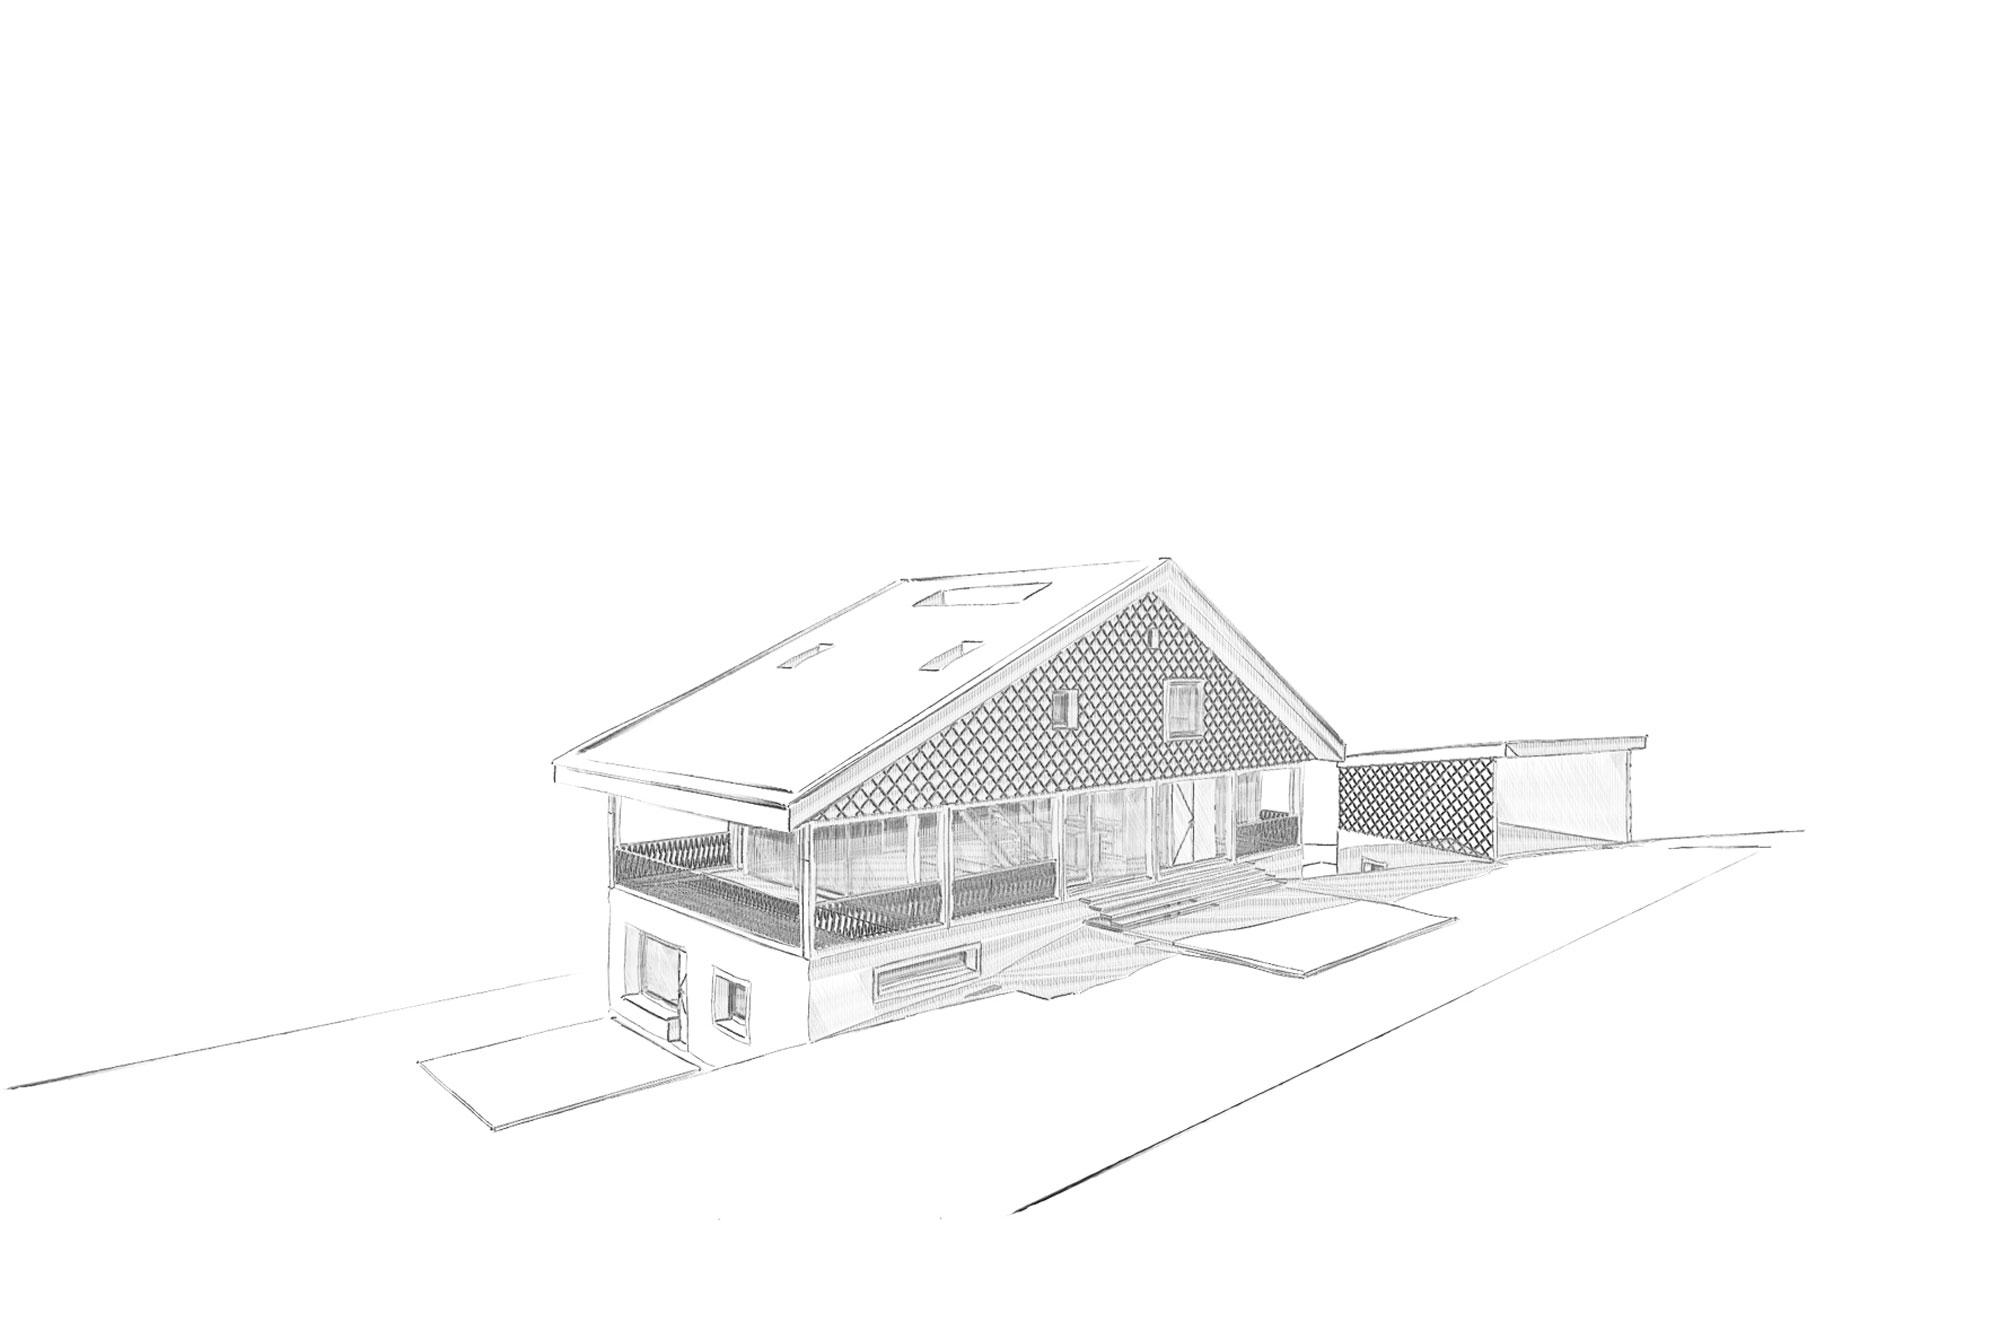 MAA_Murer_Andre_Architektur_Ersatzneubau_Buochs_004.jpg